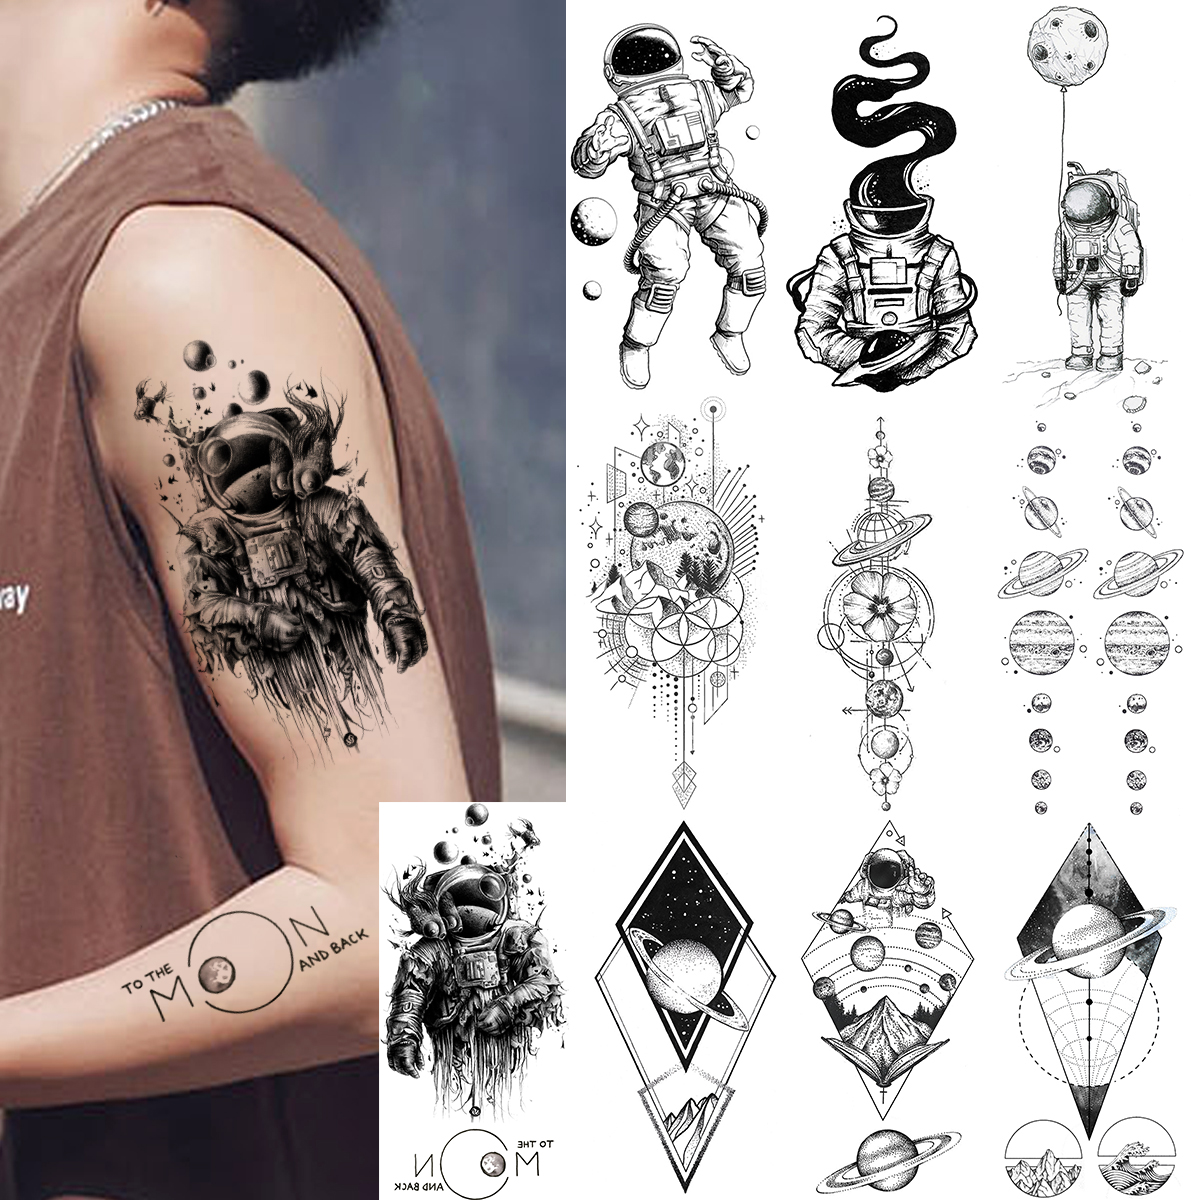 Waterproof Realistic Men Women Fake Tattoos Temporary Cosmonaut Planets Tattoo Sticker Universe Earth Astronaut Body Art Tatoos(China)